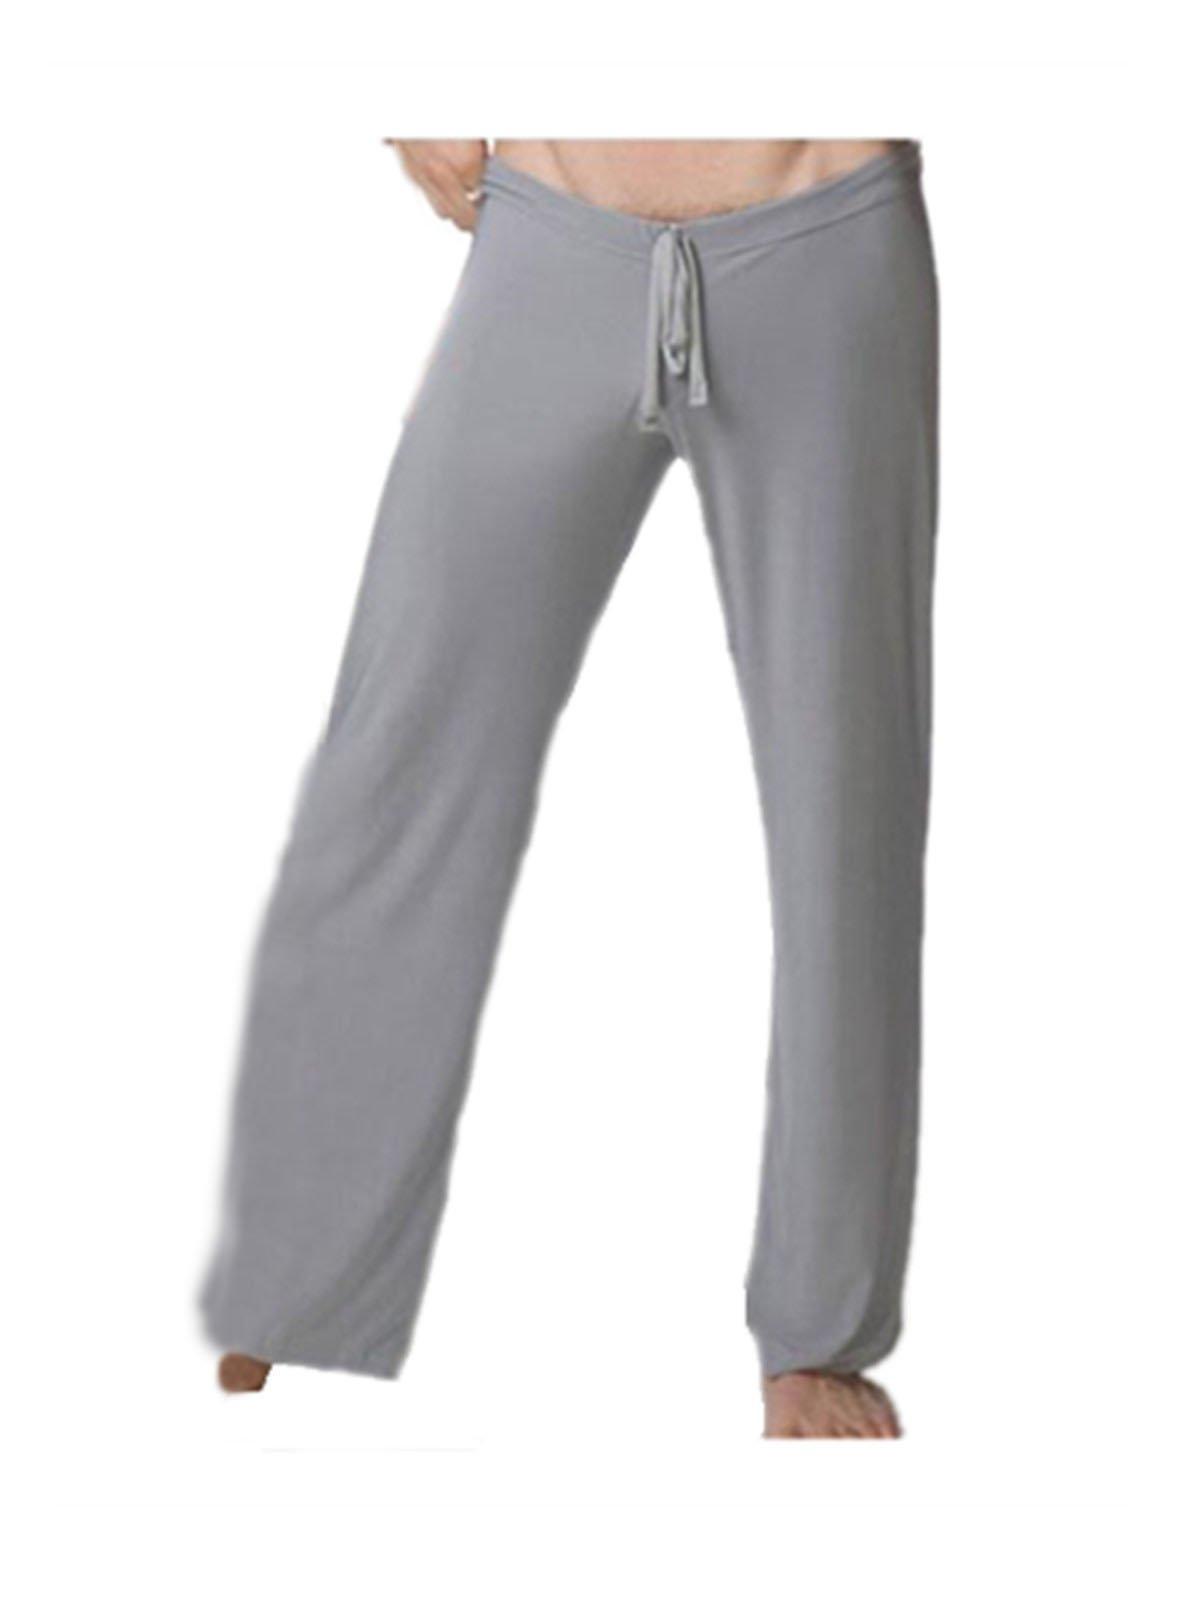 Leright Men's Yoga Long Pants Loose-Fitting Pajama Trousers Lounge Sleep Pants, Grey, L(US Size M)